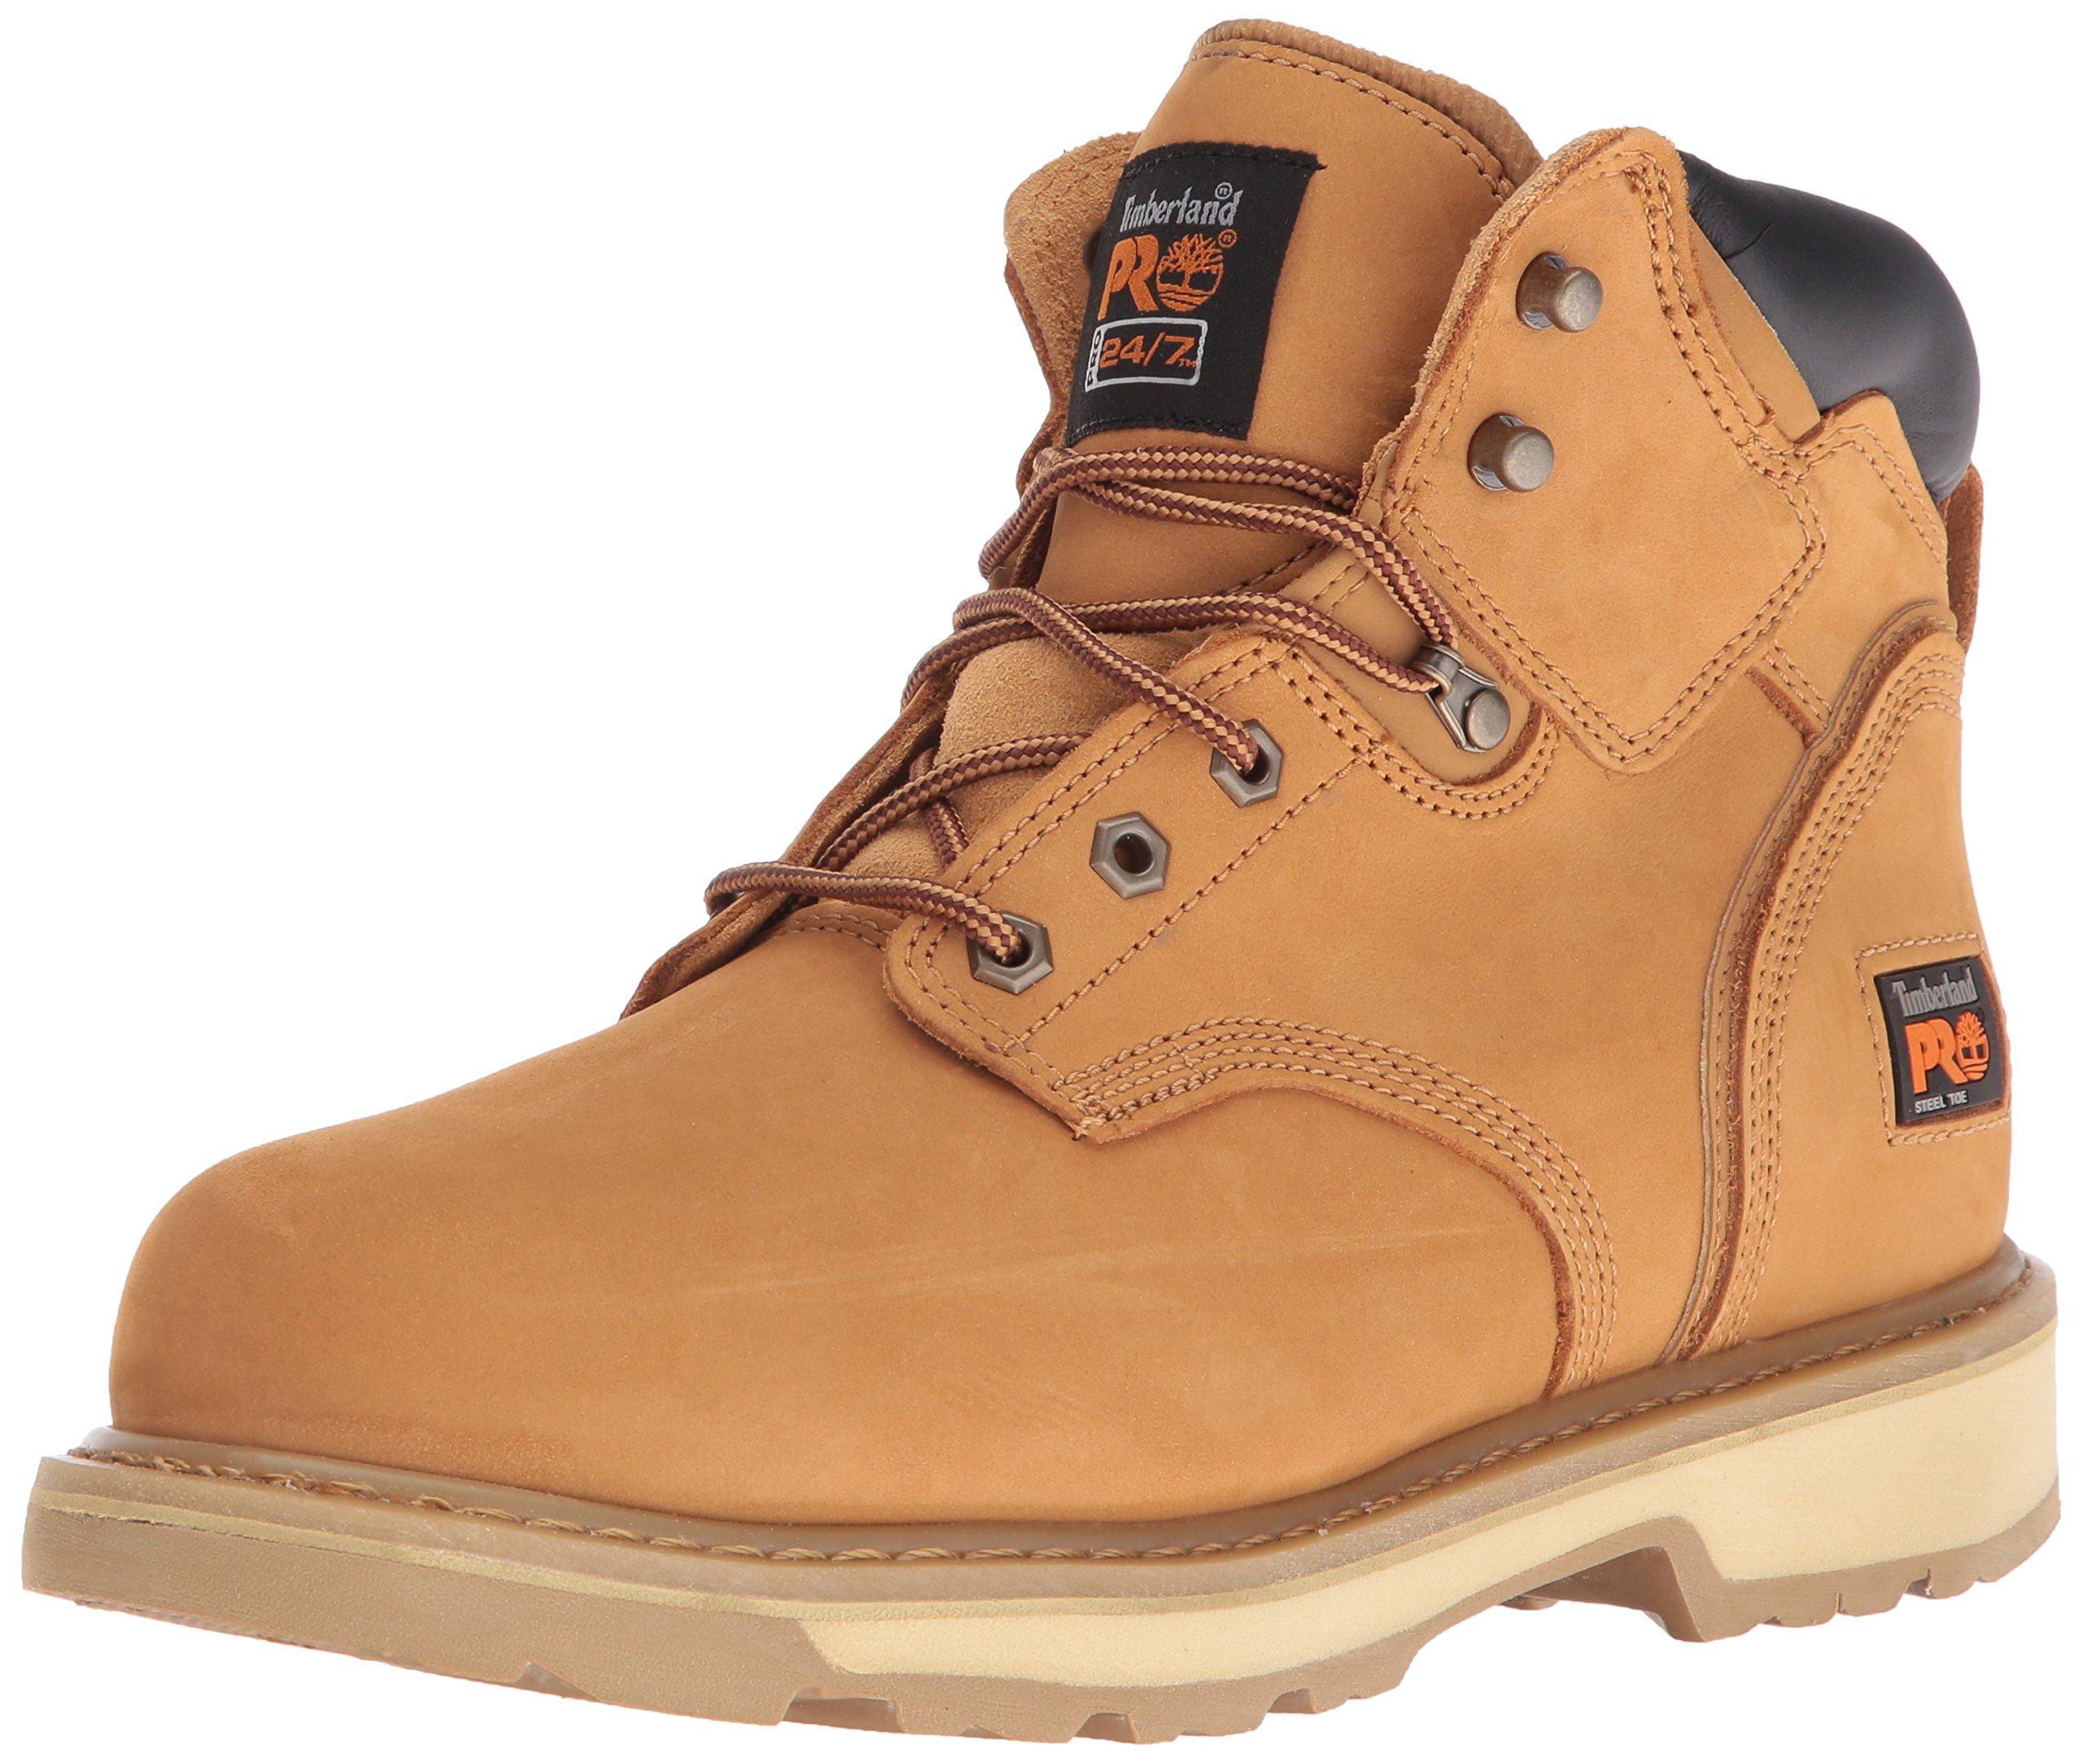 Timberland PRO Men's Pitboss 6'' Steel-Toe Boot, Wheat , 13 EE - Wide